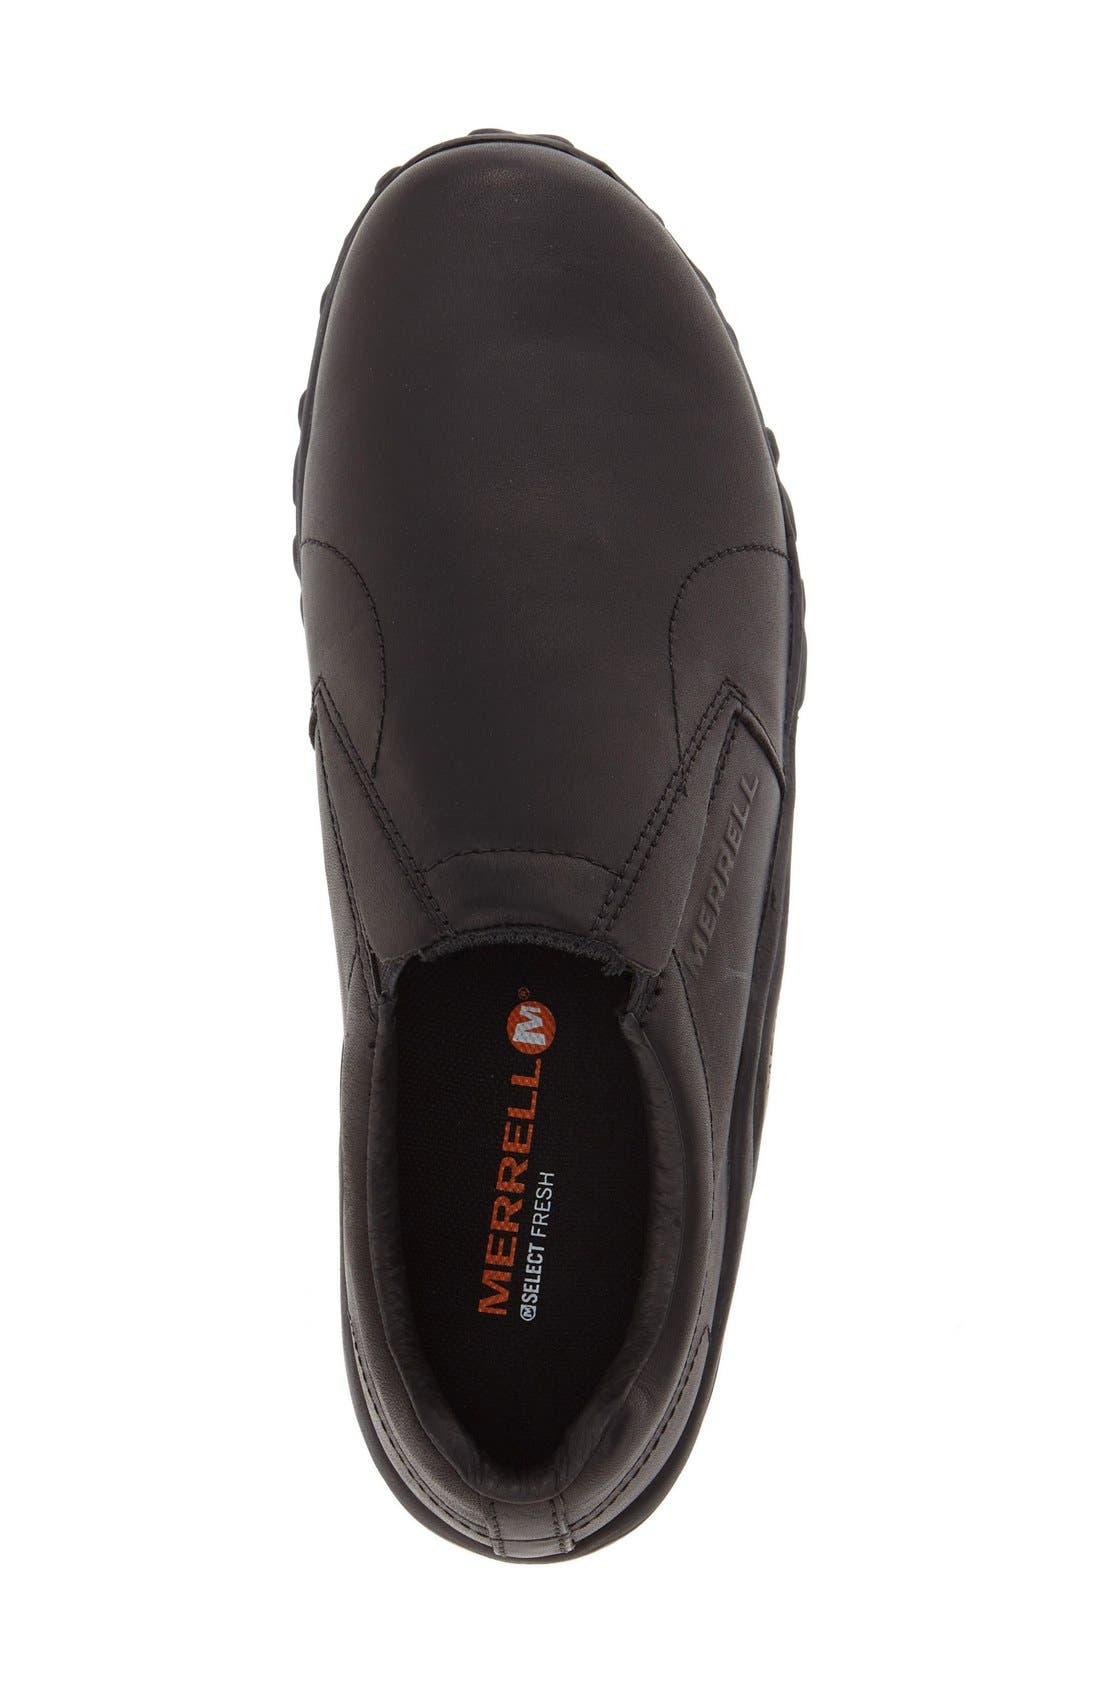 MERRELL, 'Jungle Moc' Leather Athletic Slip-On, Alternate thumbnail 4, color, BLACK